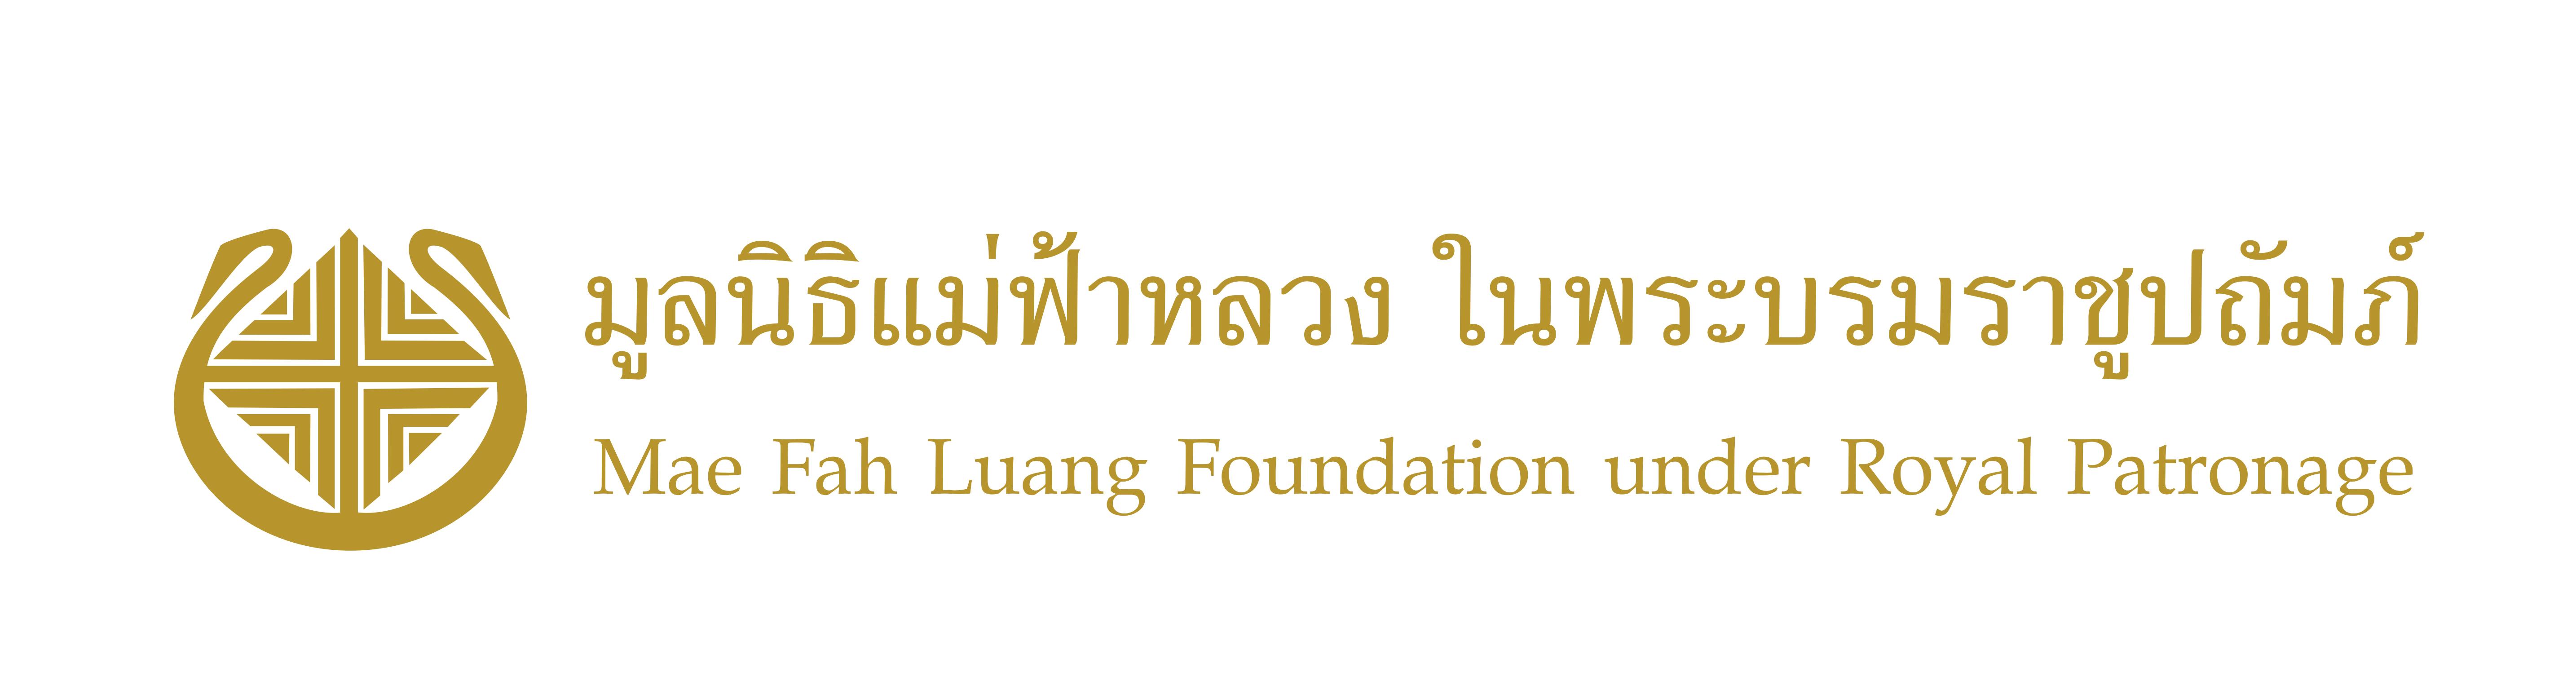 Mae Fah Luang Foundation under Royal Patronage